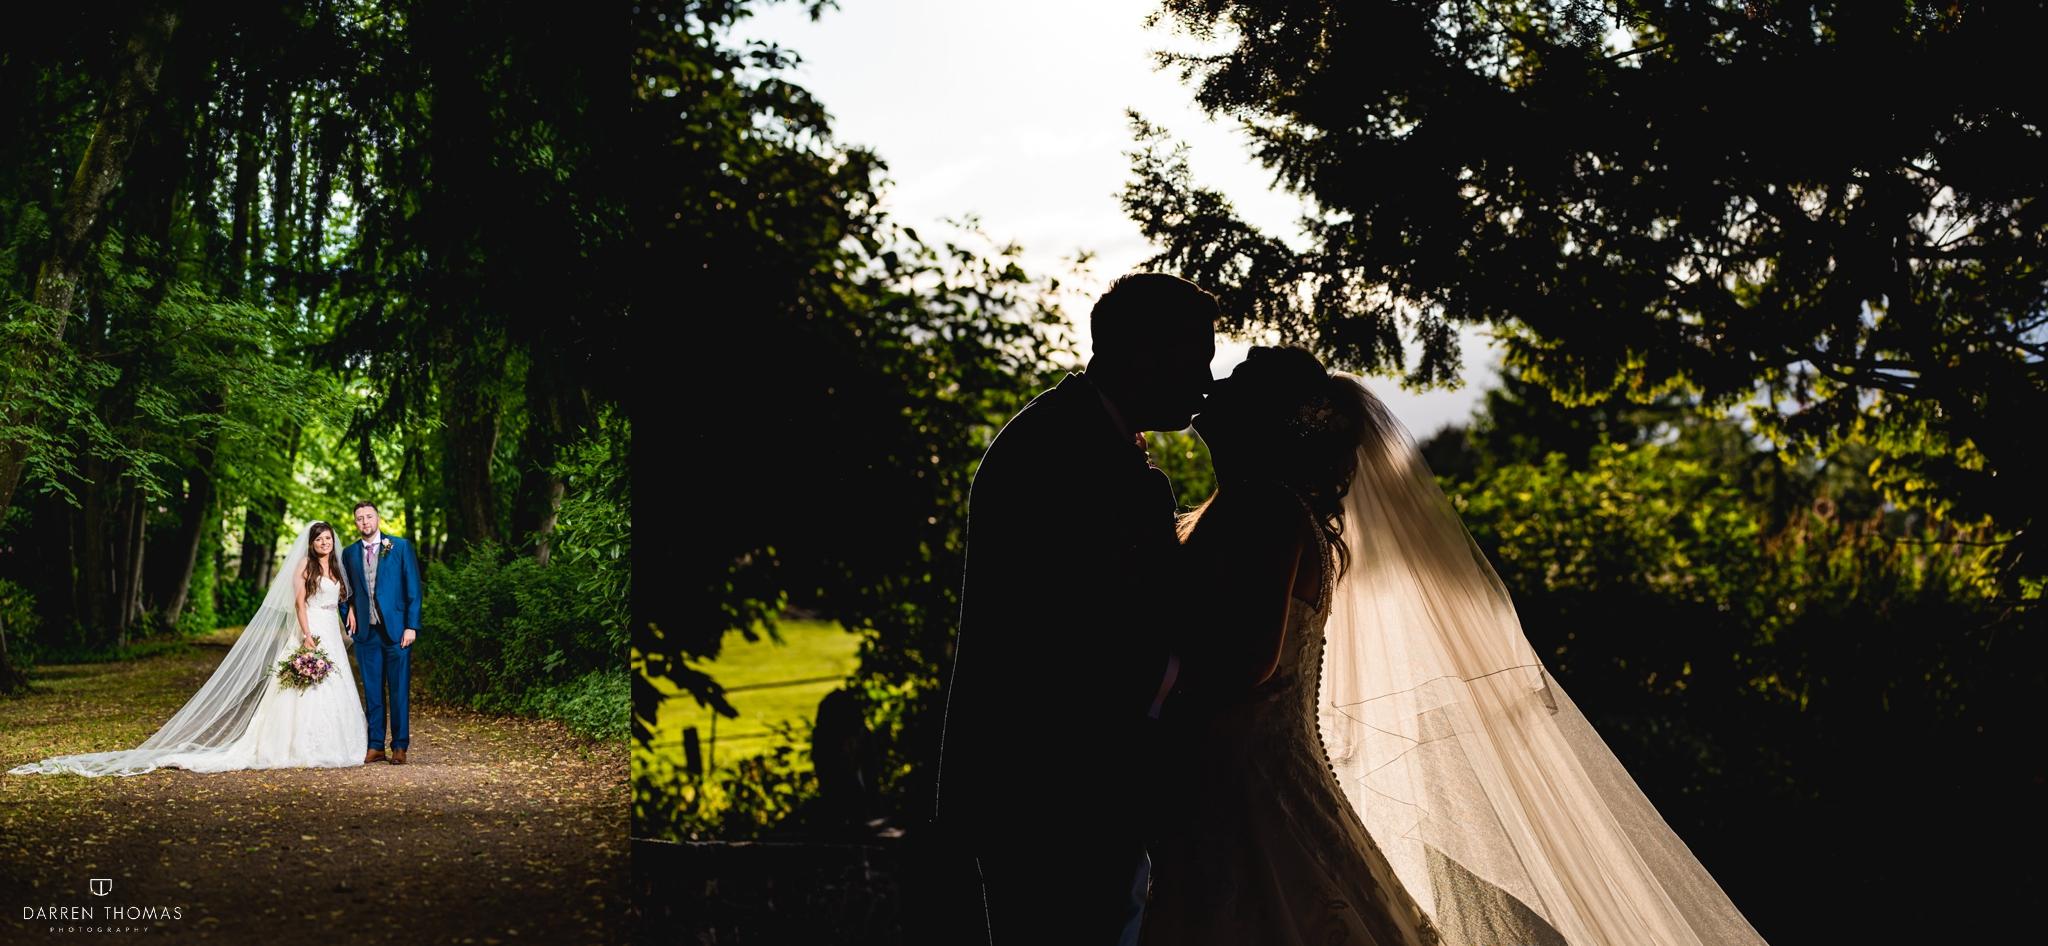 clearwell castle wedding_0019.jpg